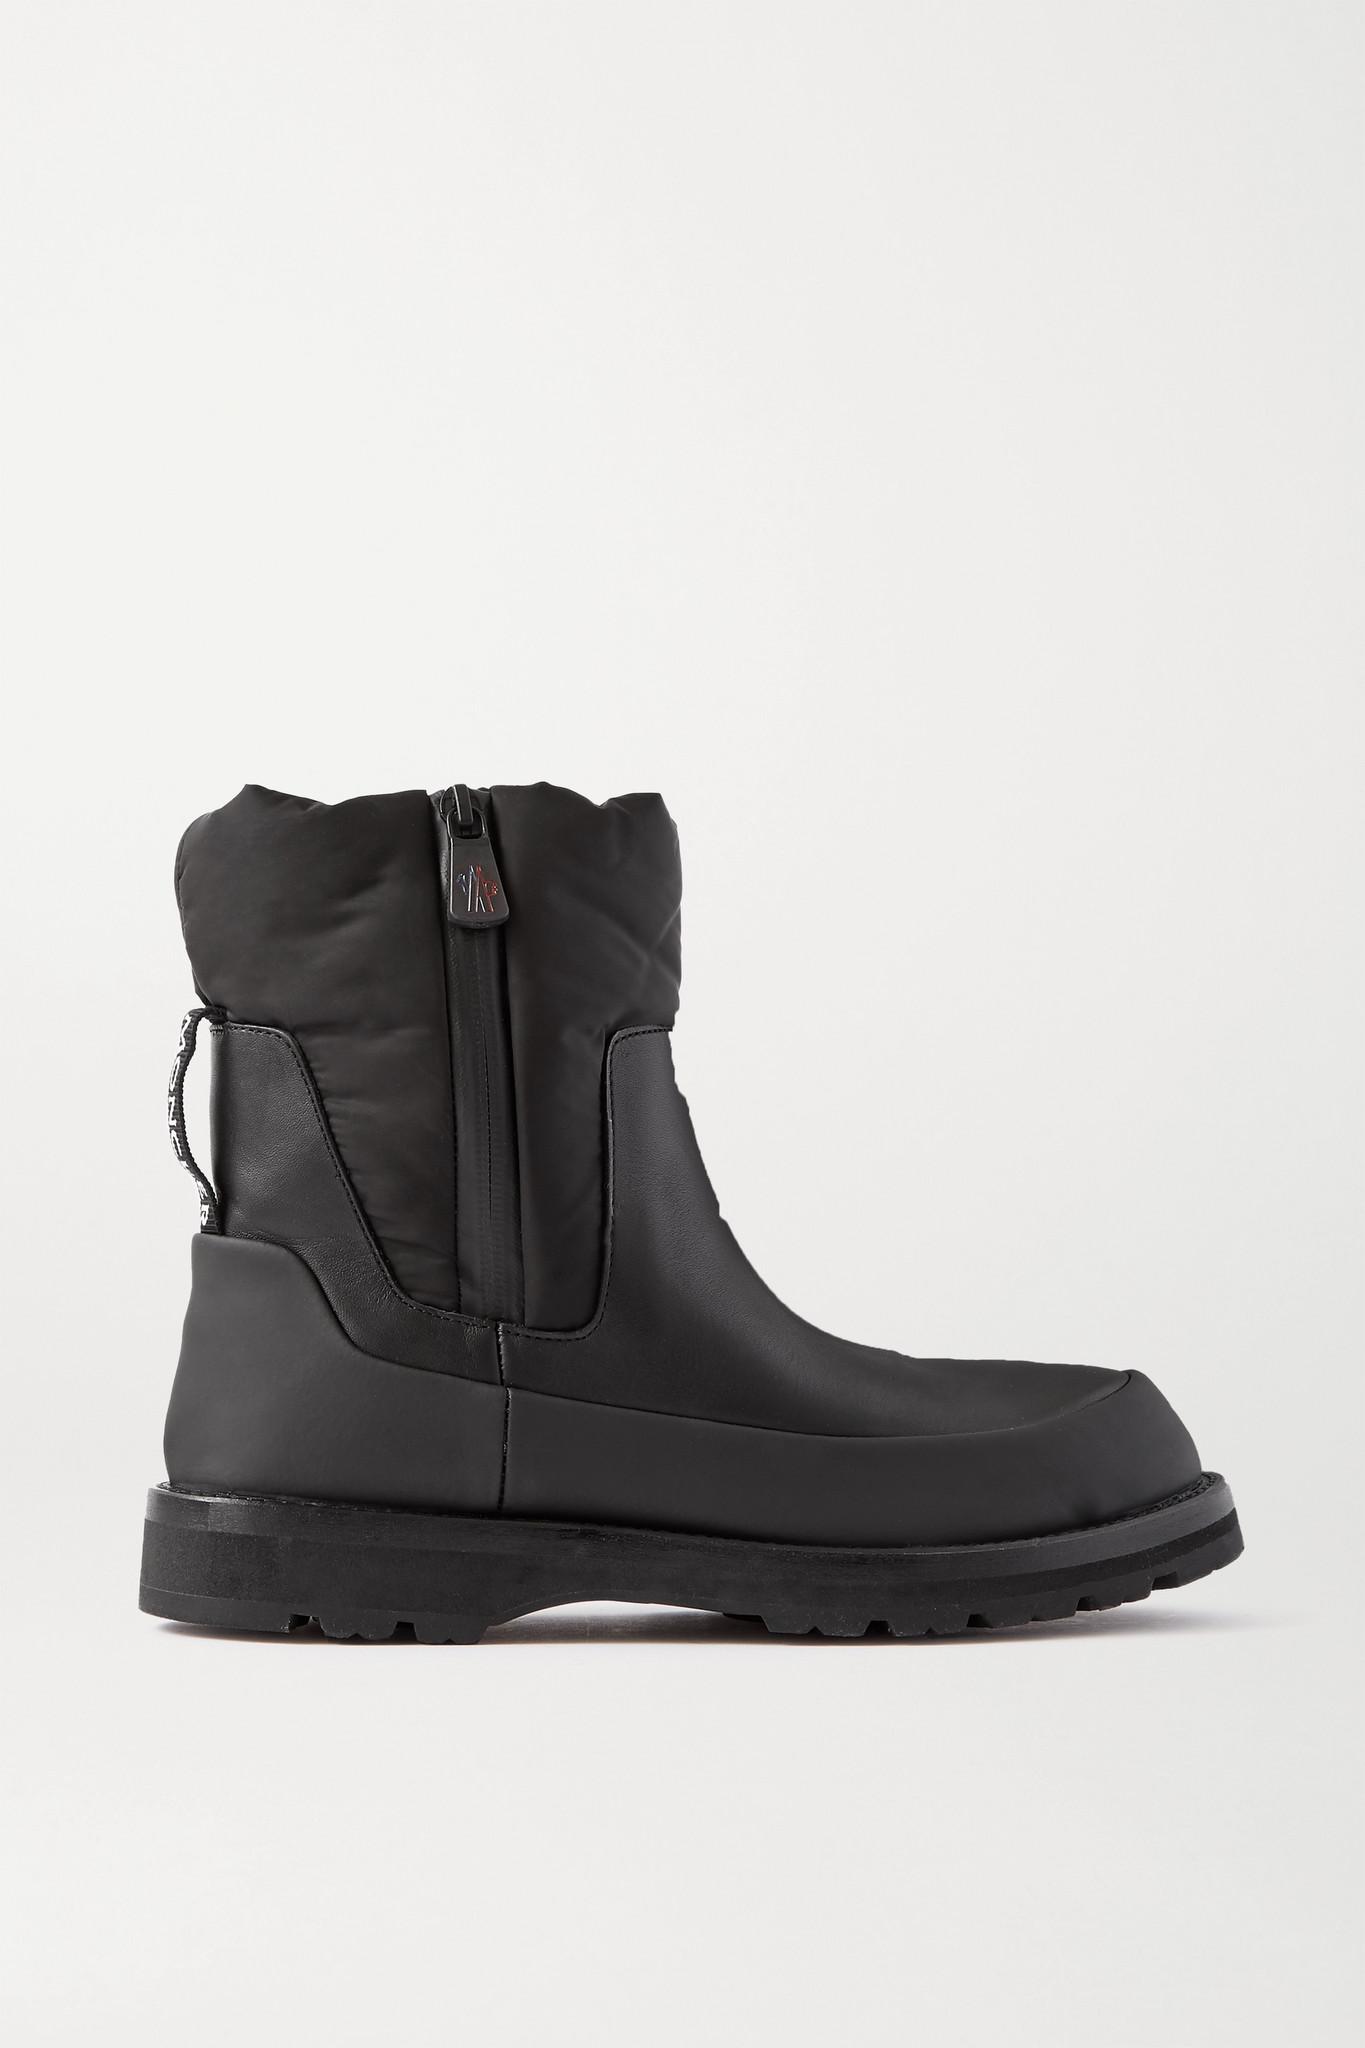 MONCLER - Rain Don't Care 拼接皮革软壳面料踝靴 - 黑色 - IT37